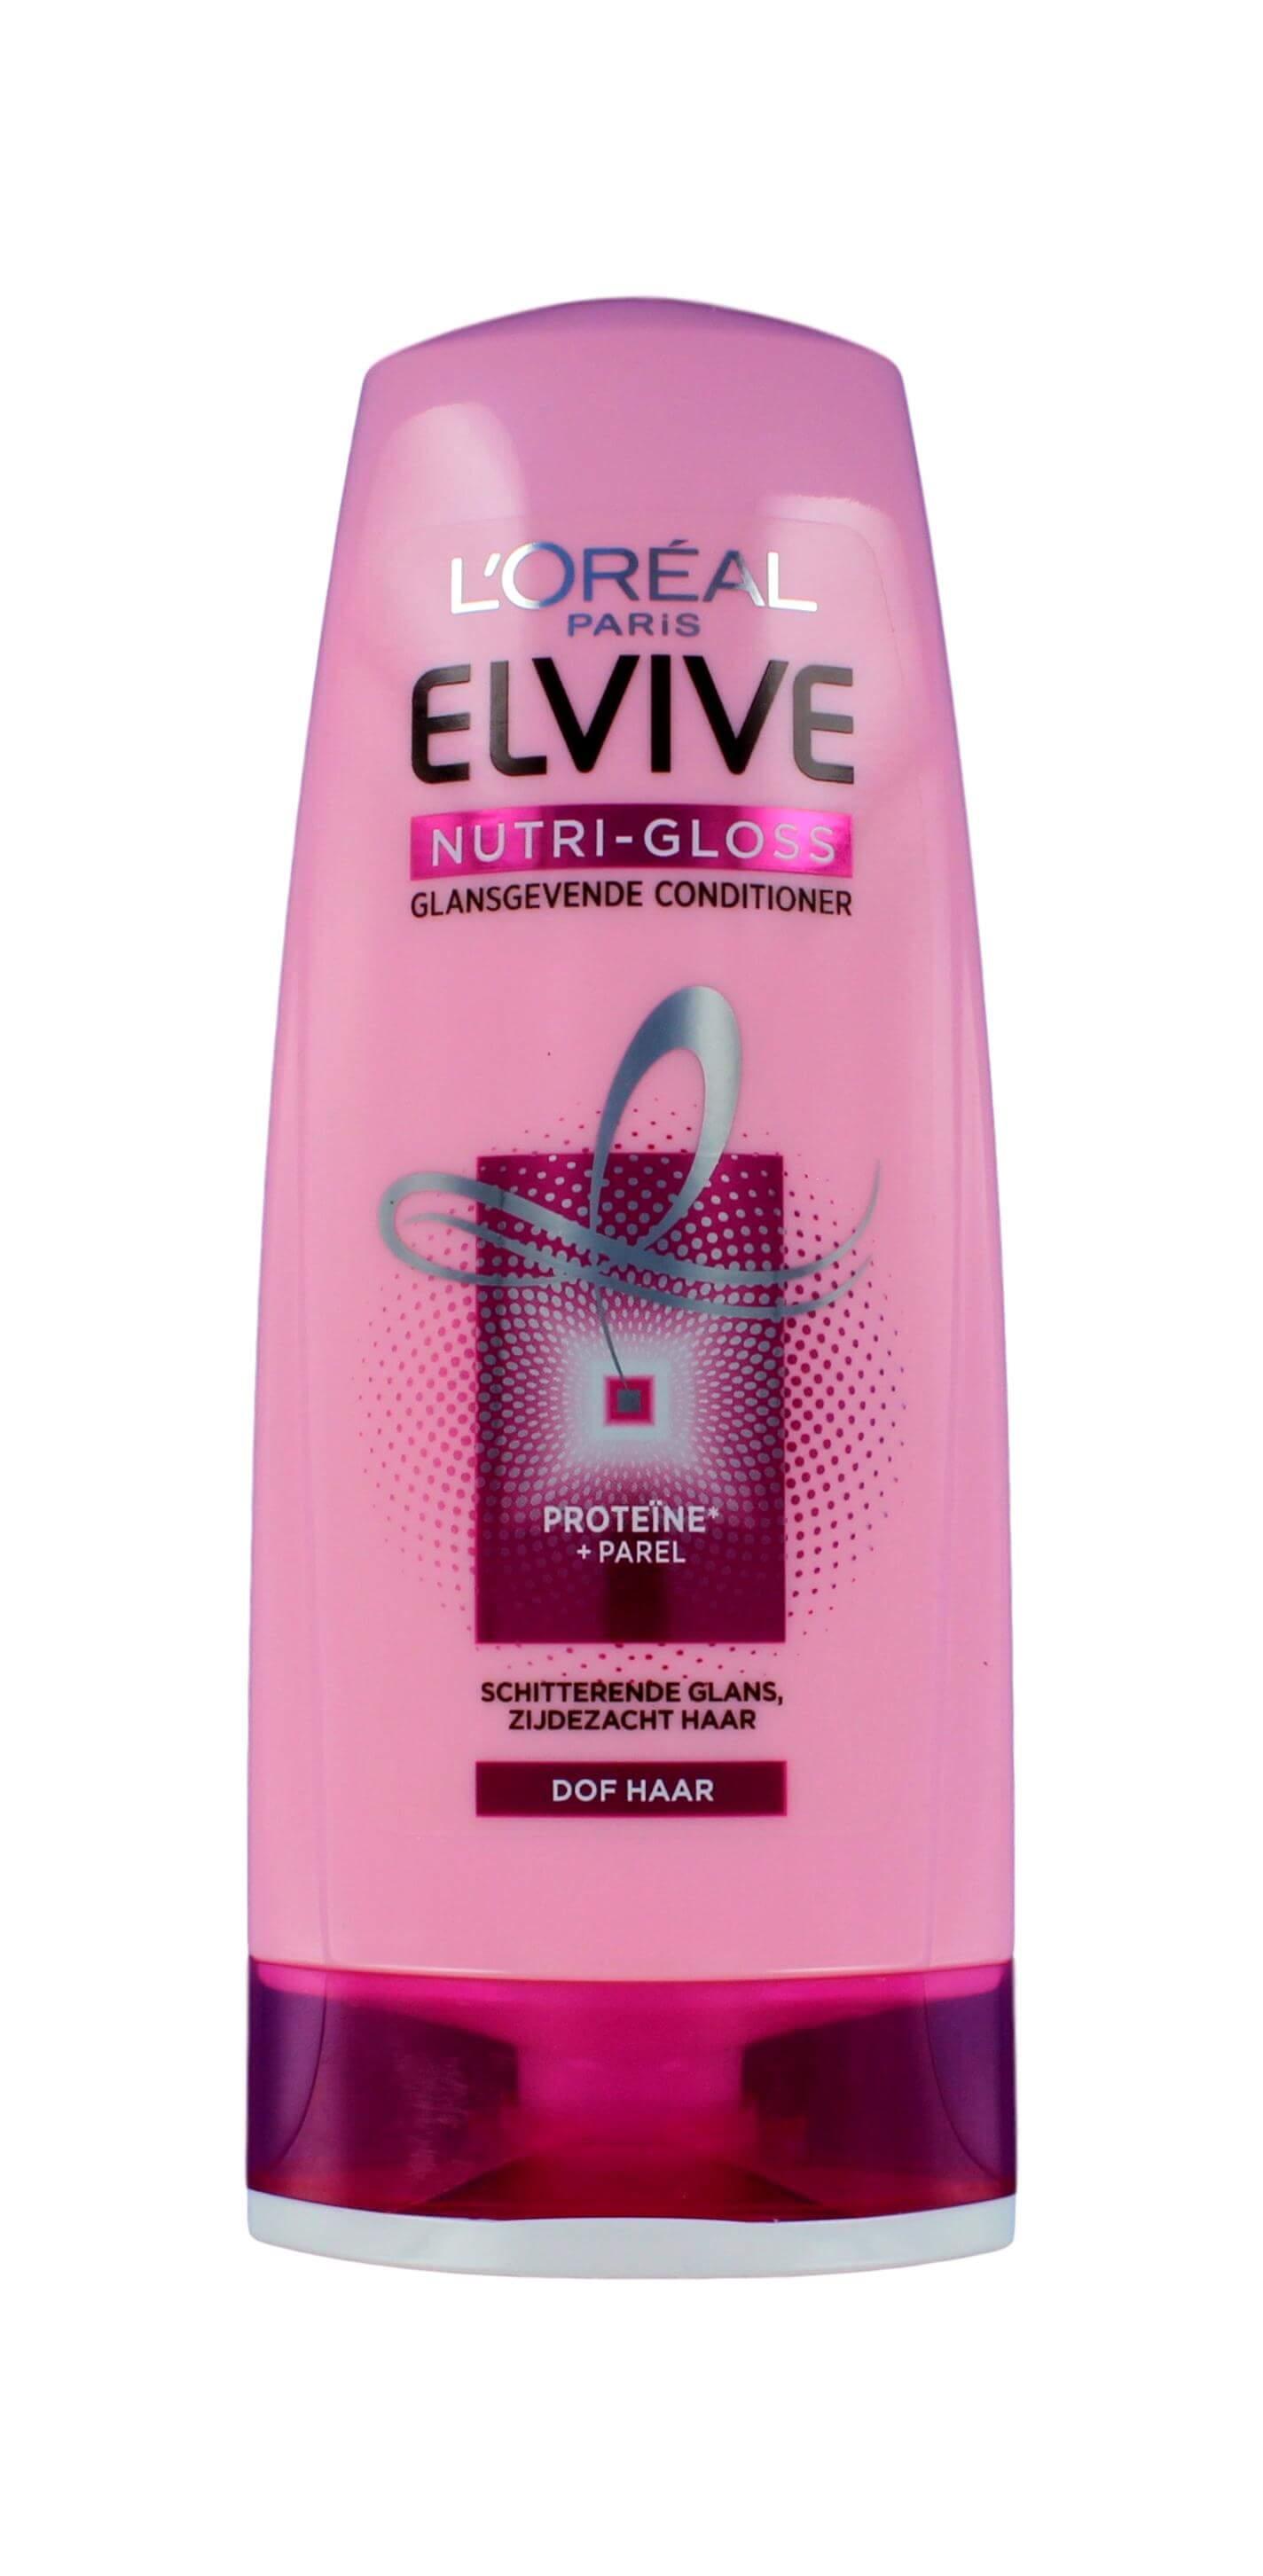 L'Oreal Elvive Conditioner Nutri Gloss, 200 ml